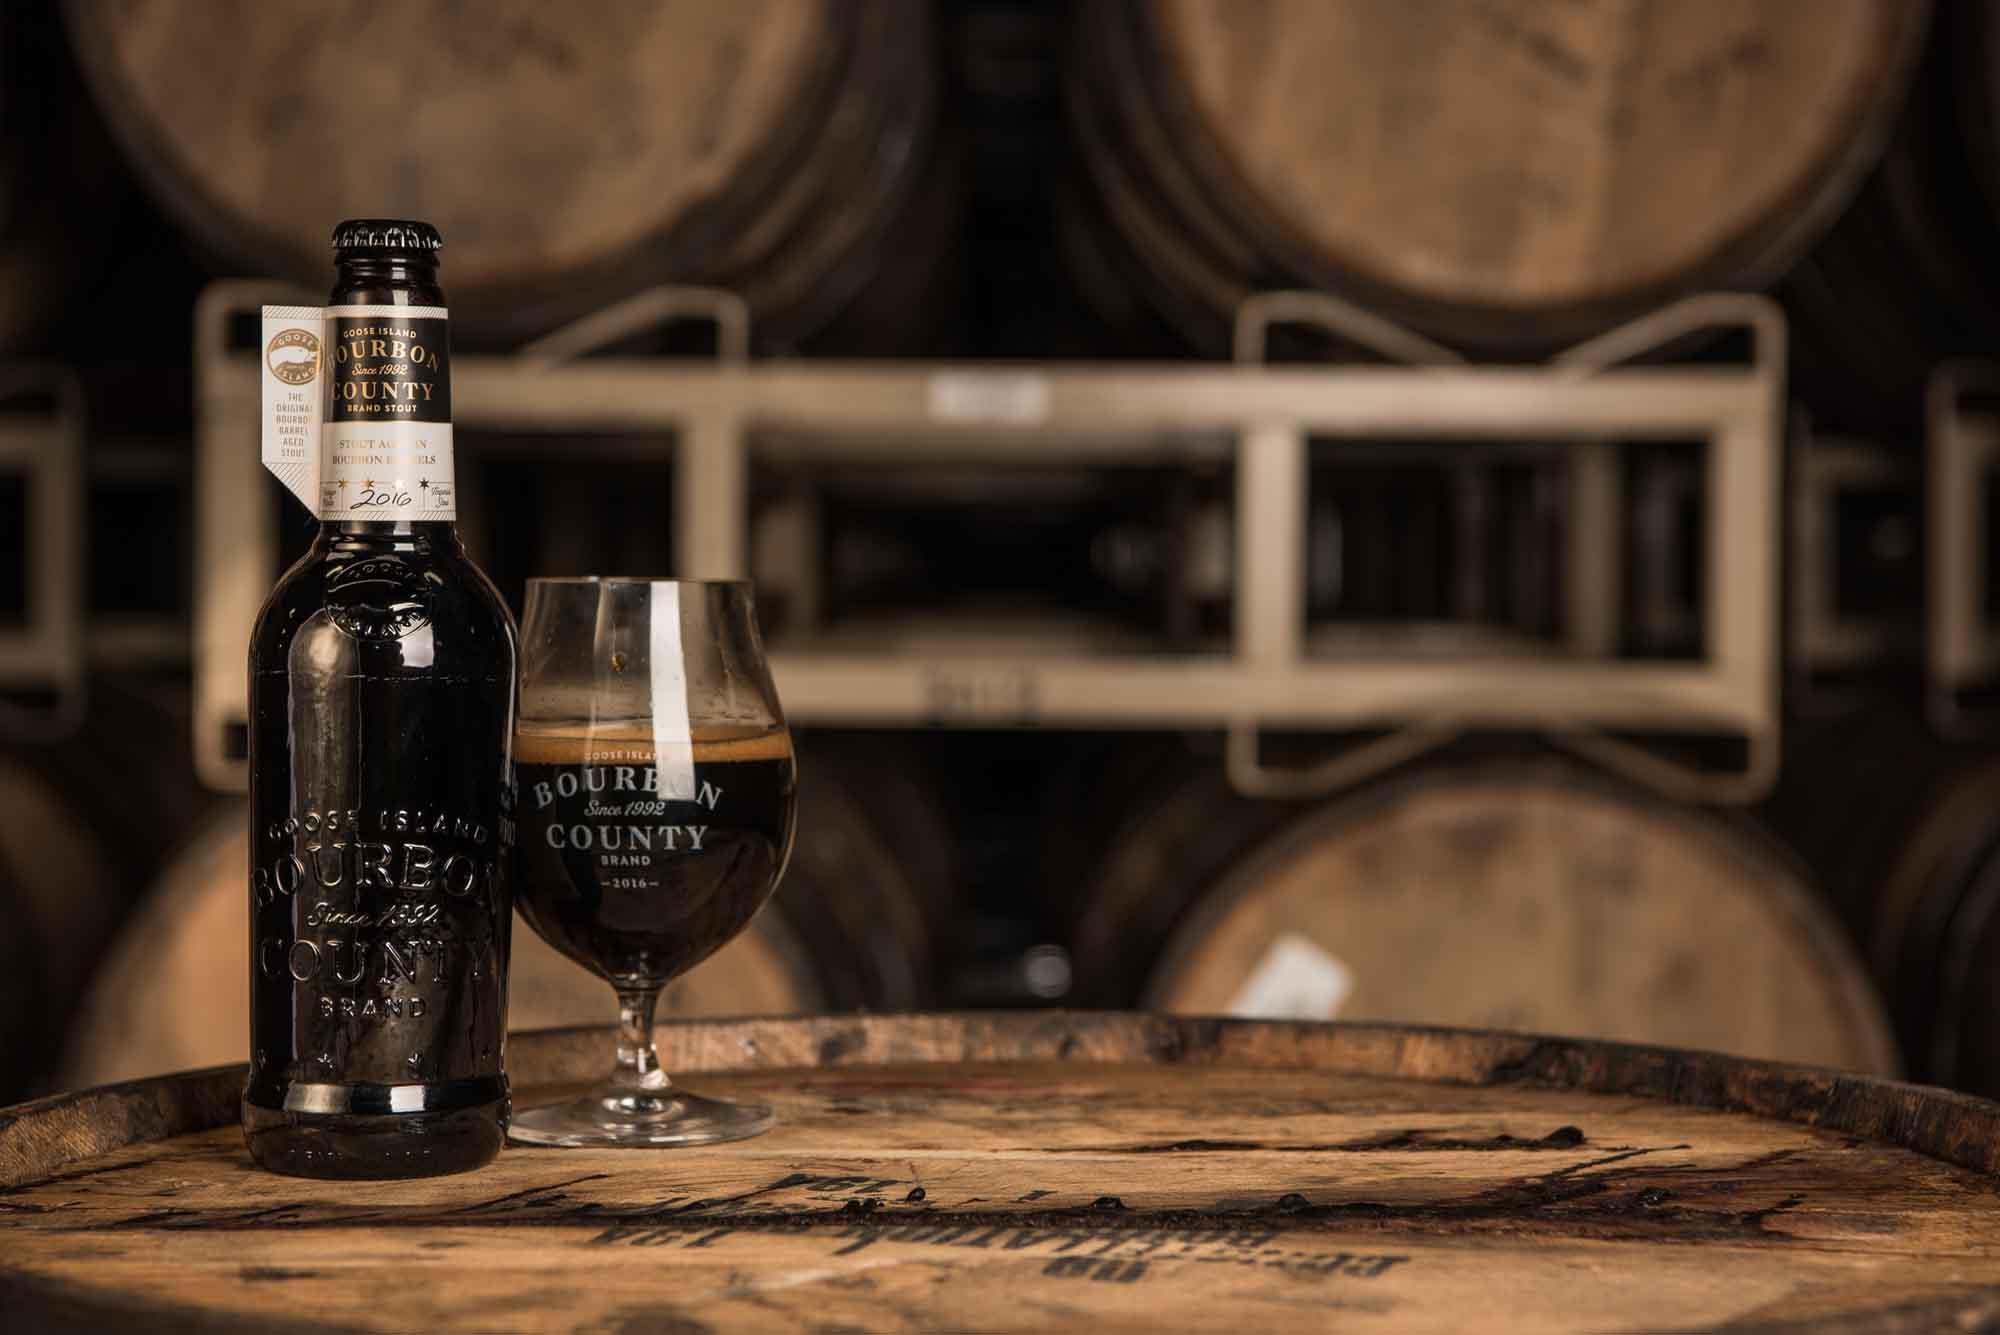 http://www.gooseisland.com/assets/images/beers/bourbon-county-brand-stout/GIBC_Bourbon_County_Orginal_2016.jpg